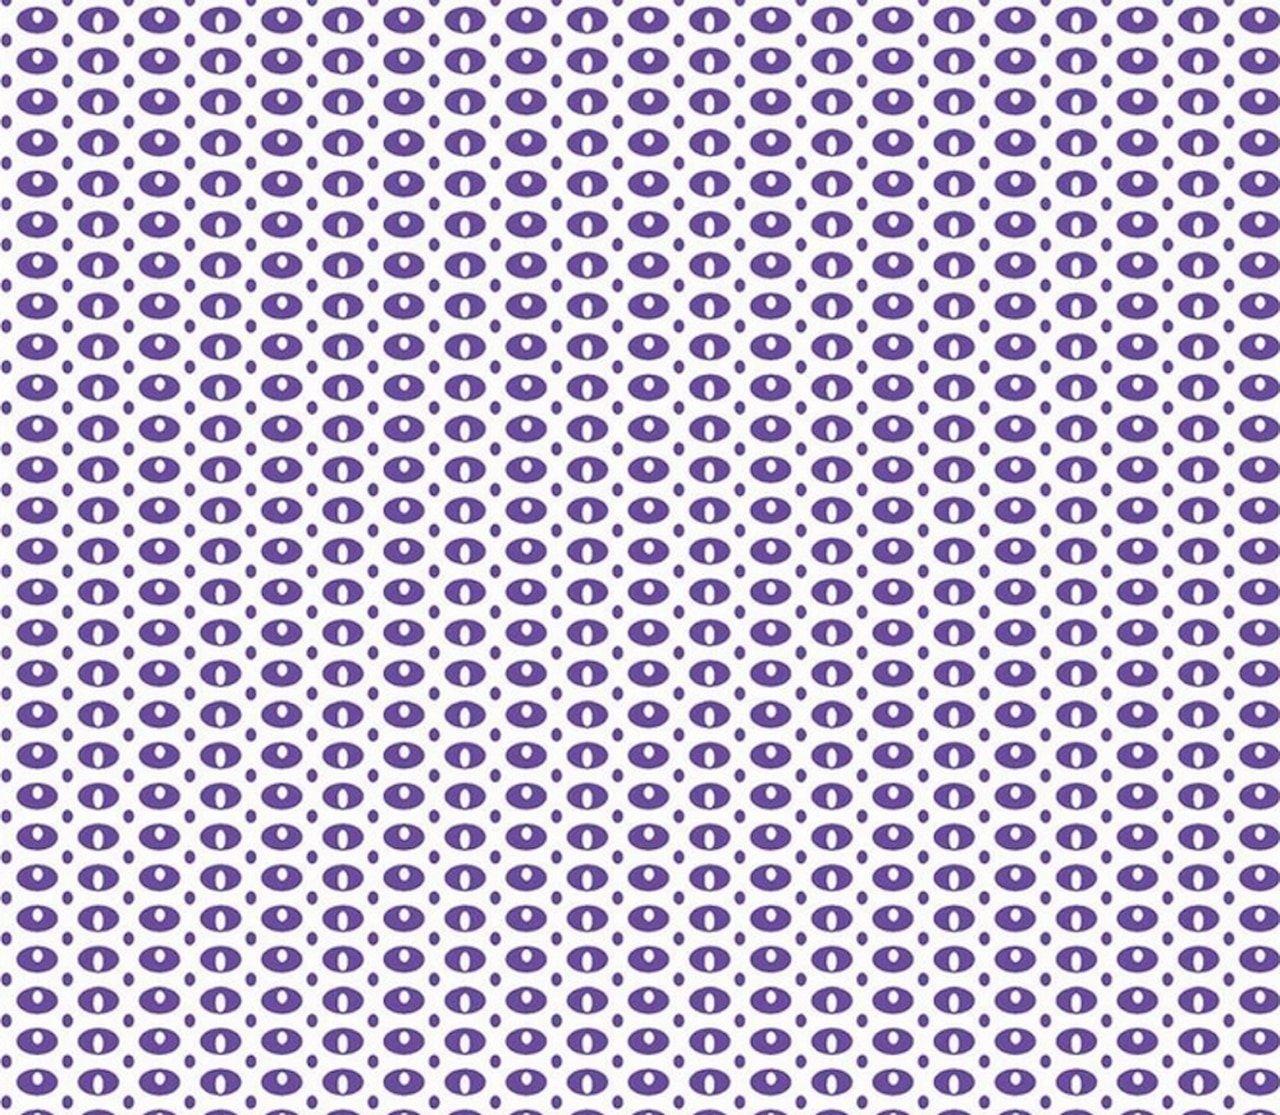 Dot Mania (4512-431)